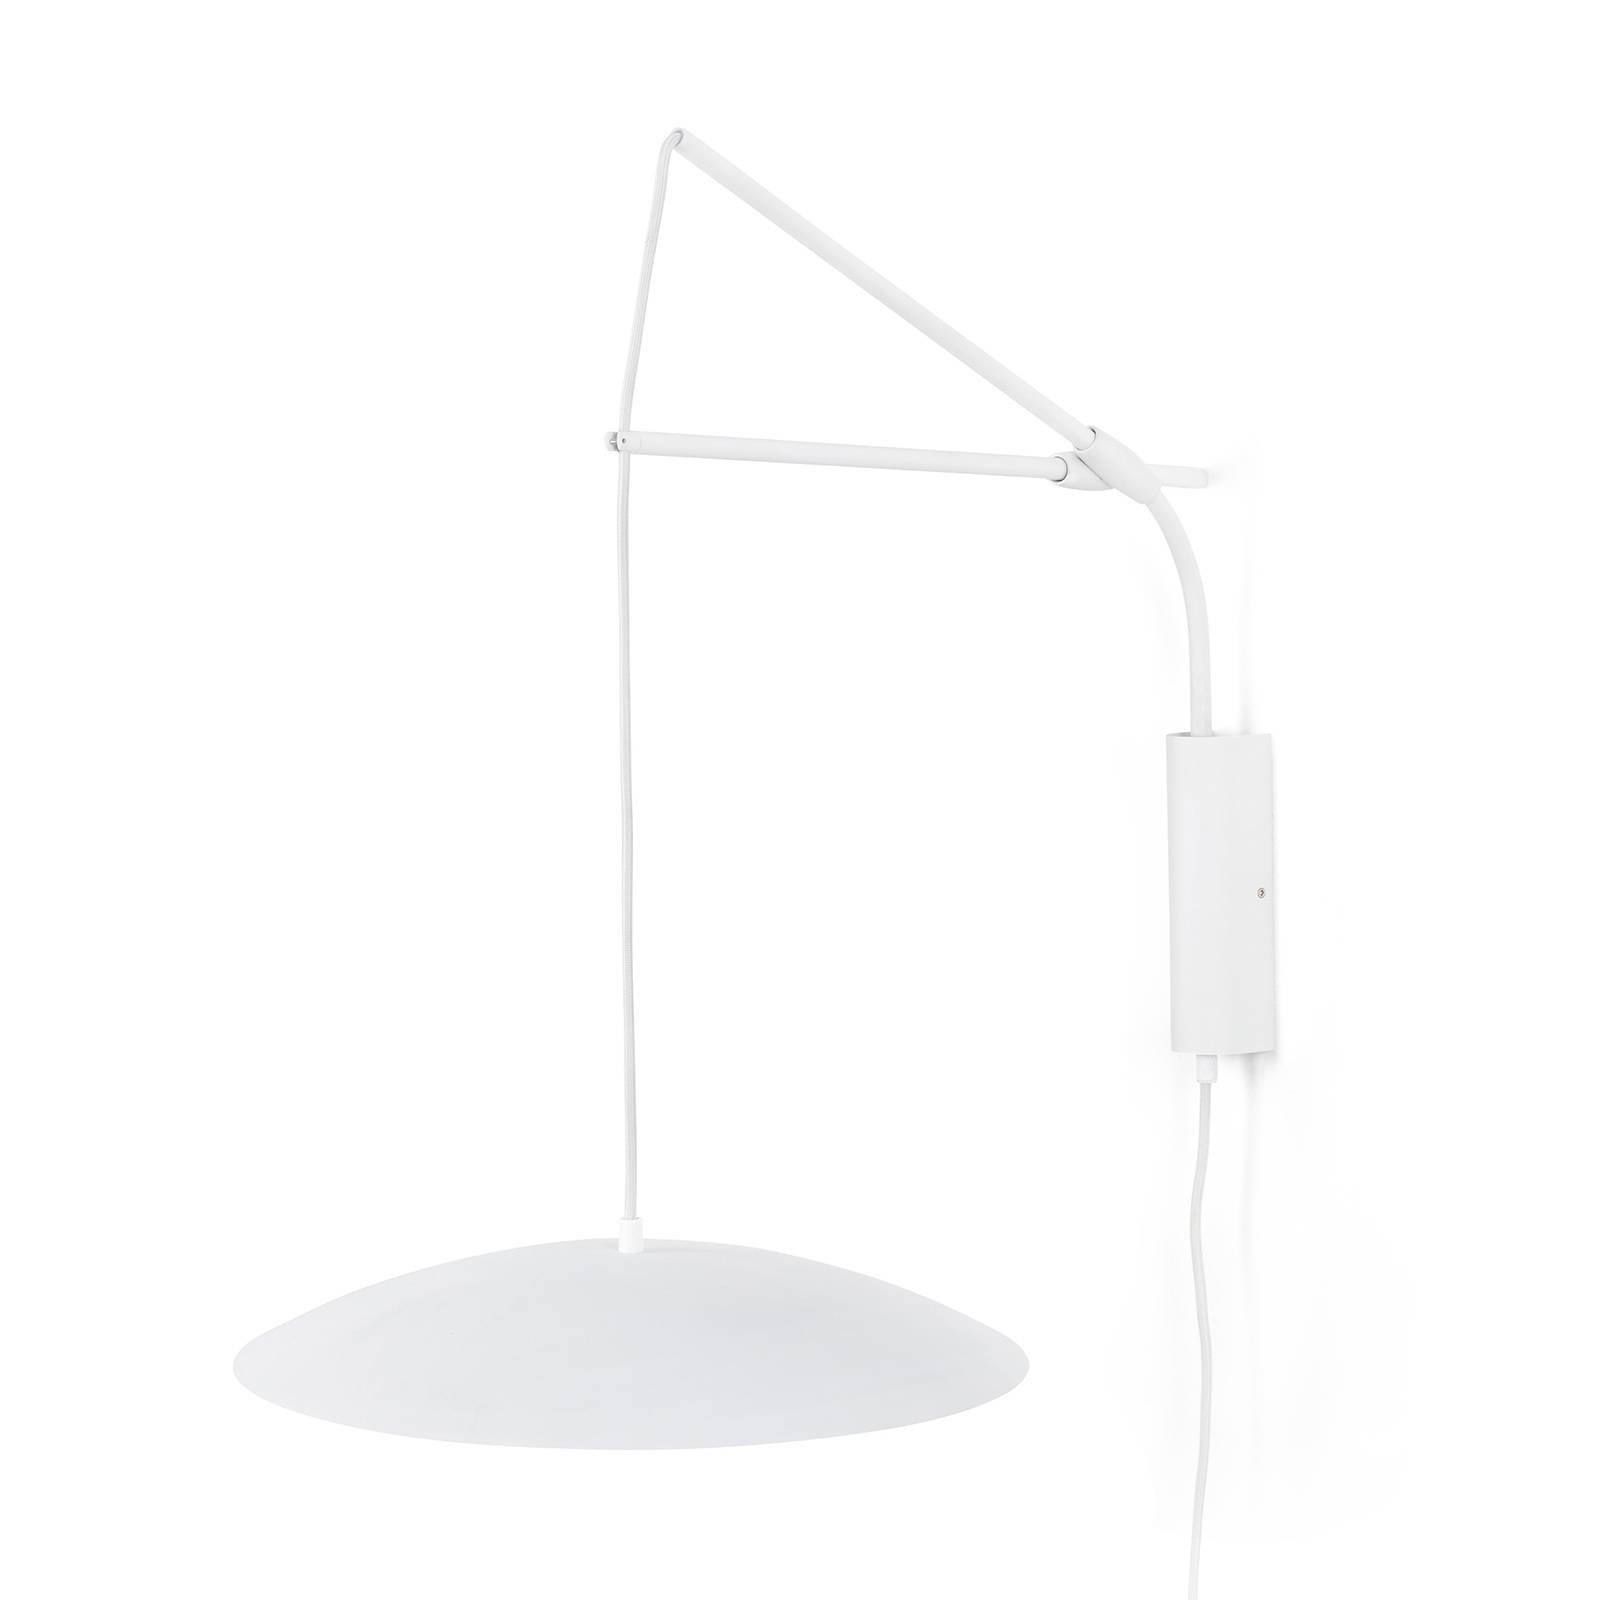 LED-vegglampe Slim med plugg, hvit